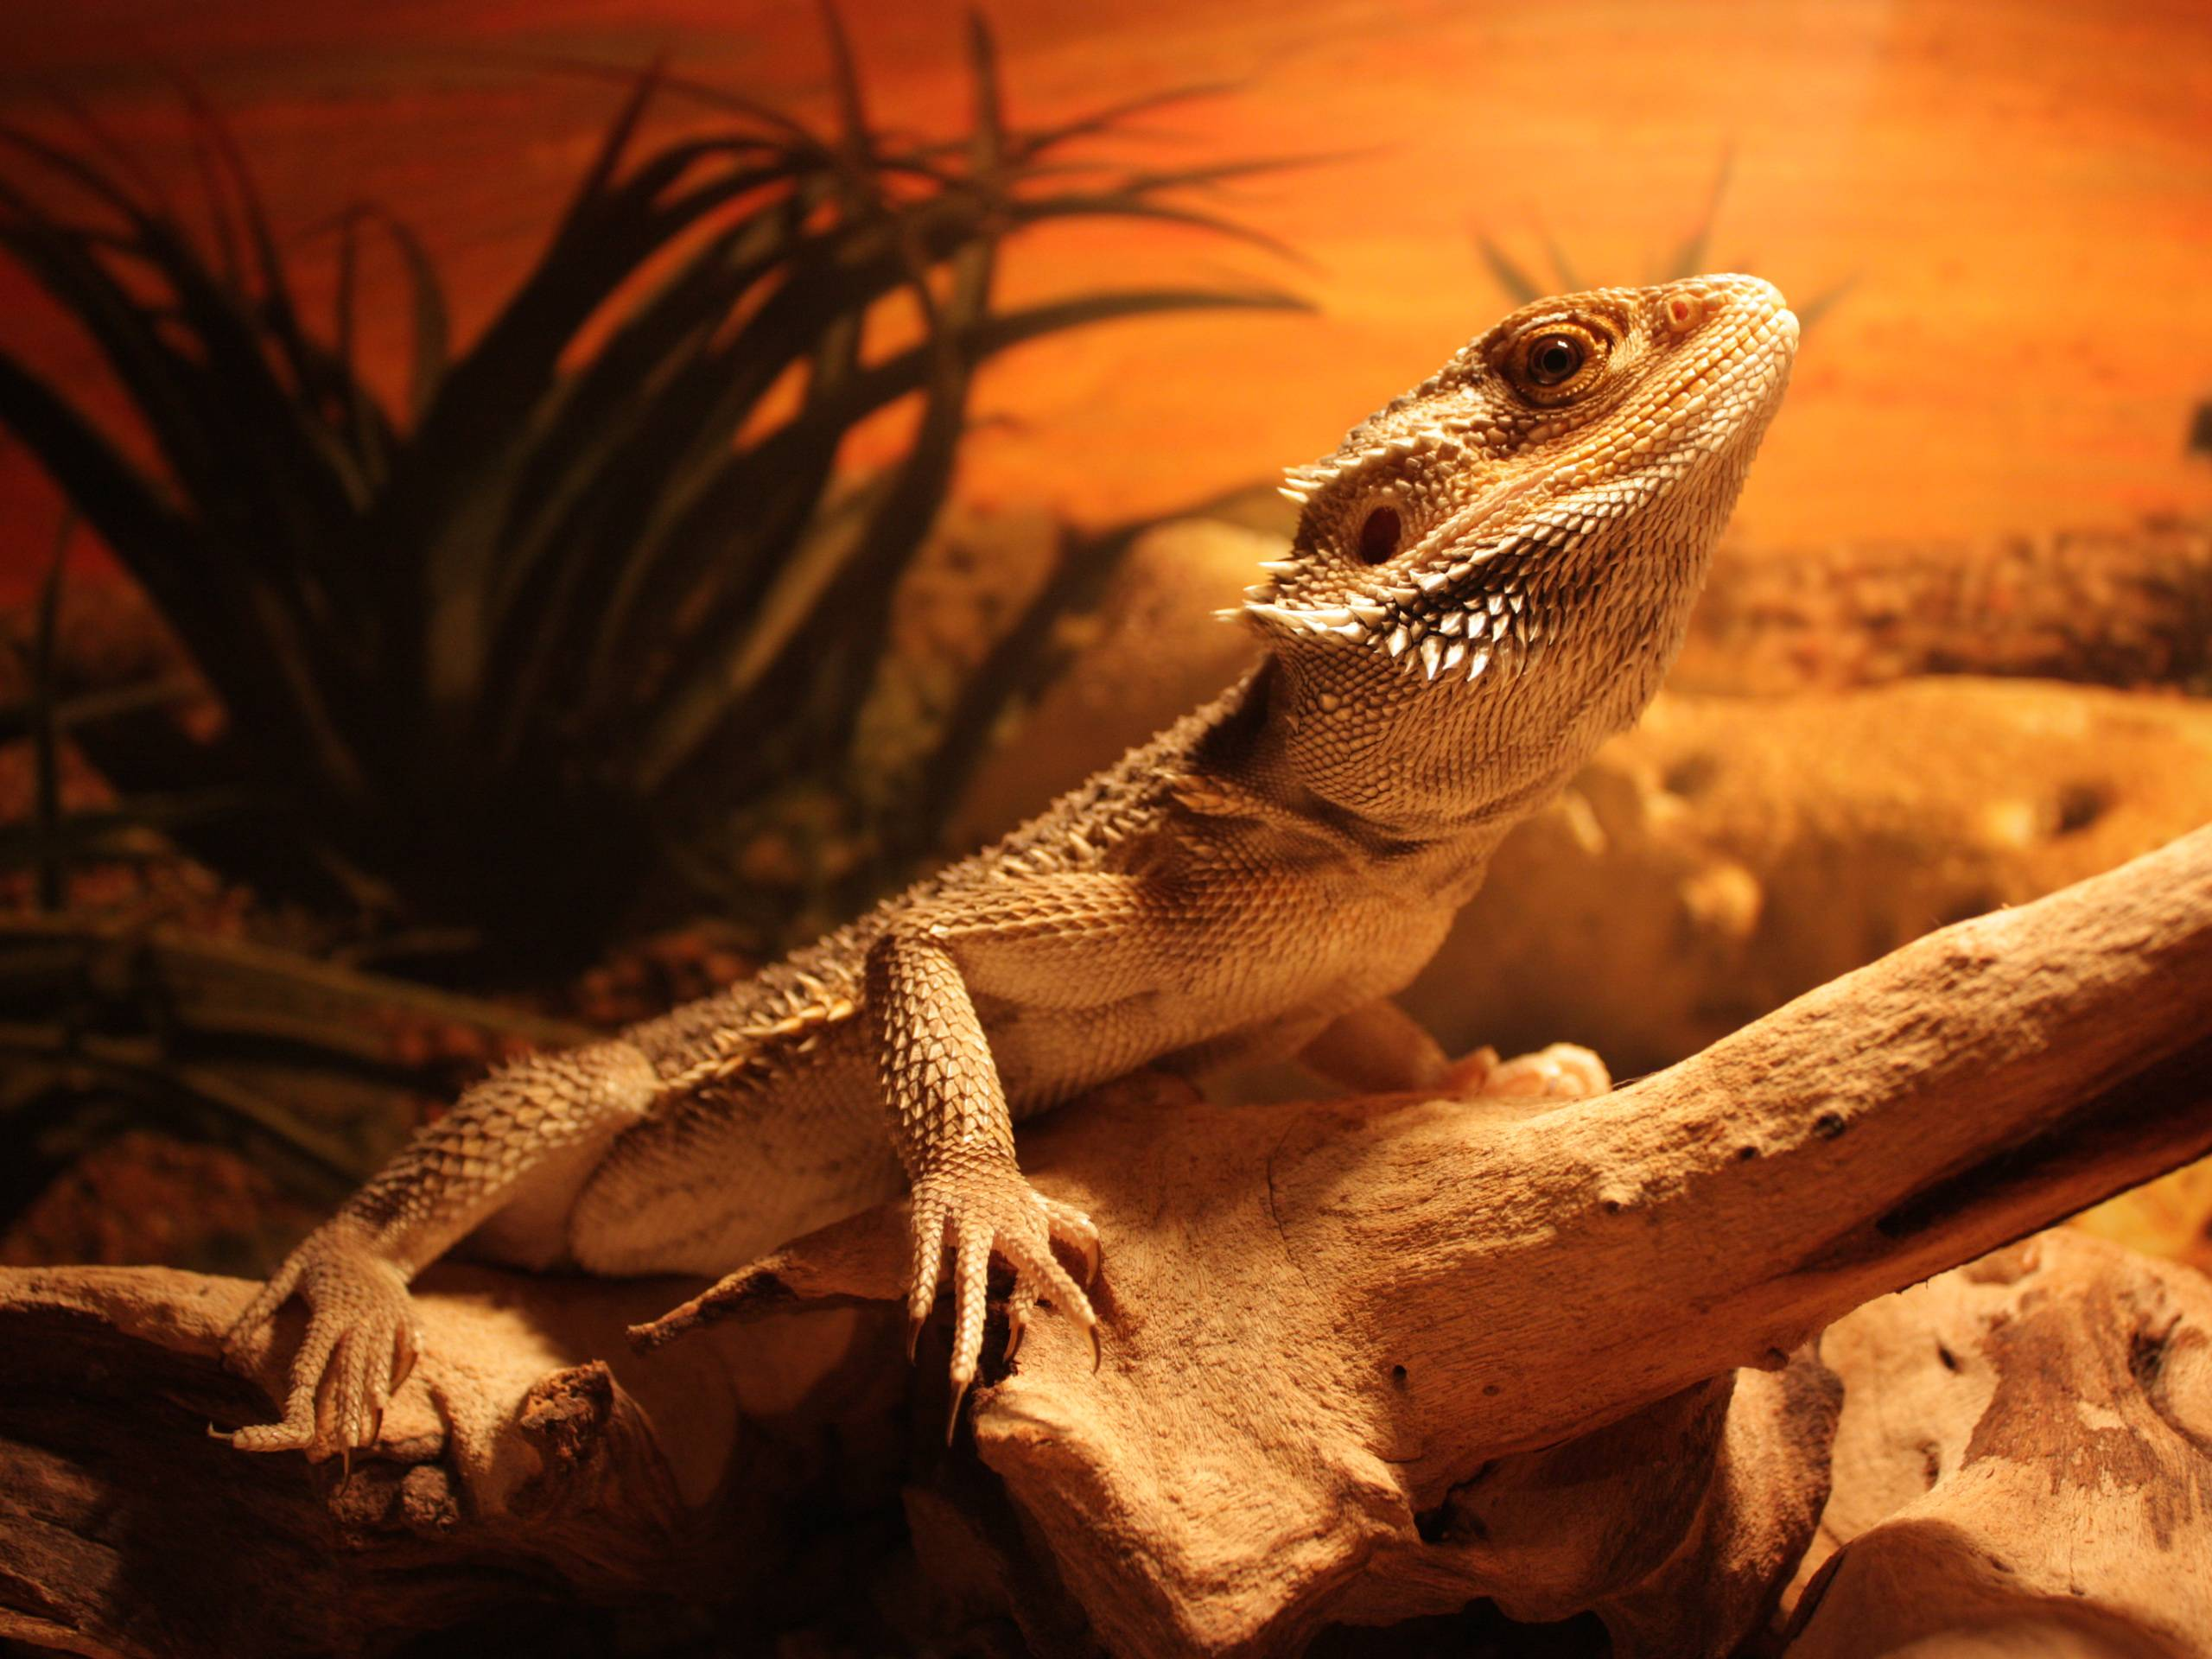 Lizard Wallpapers - Wallpaper Cave